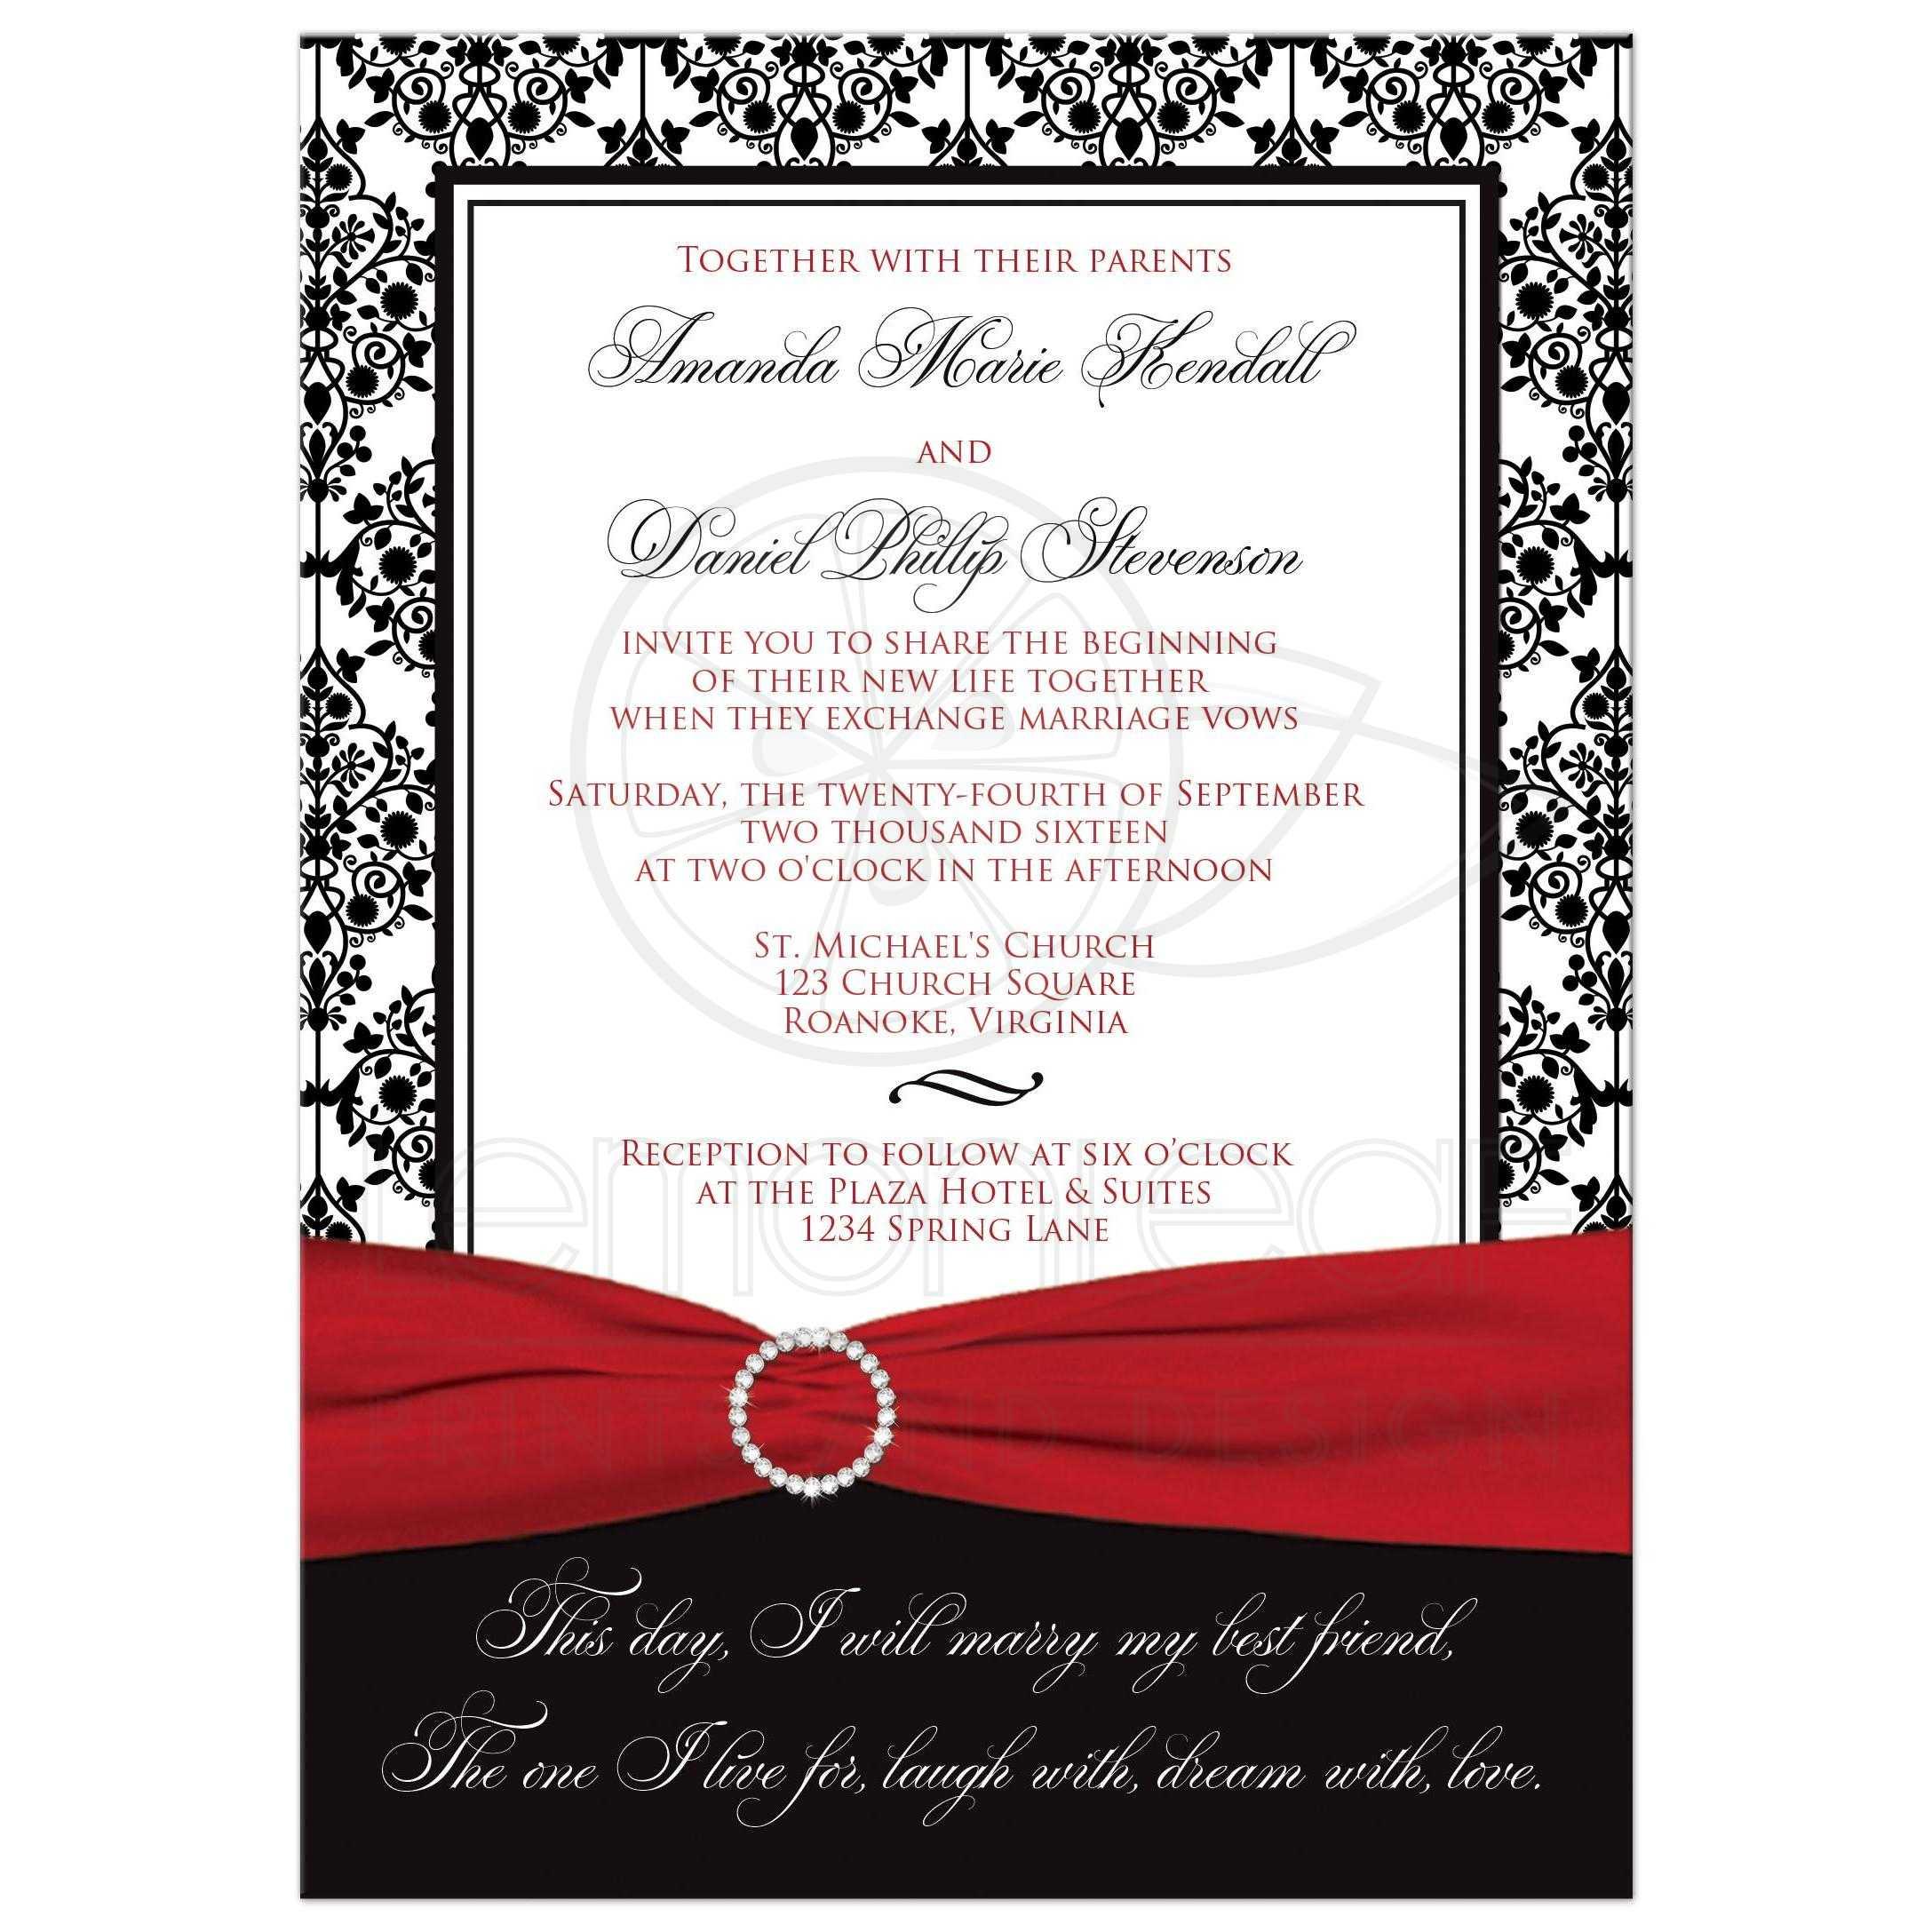 42516_Rectangle_RedBlackDamaskDiamonds?t=1456273222 wedding invitation black, white damask printed red ribbon,Wedding Invitations Red Black And White